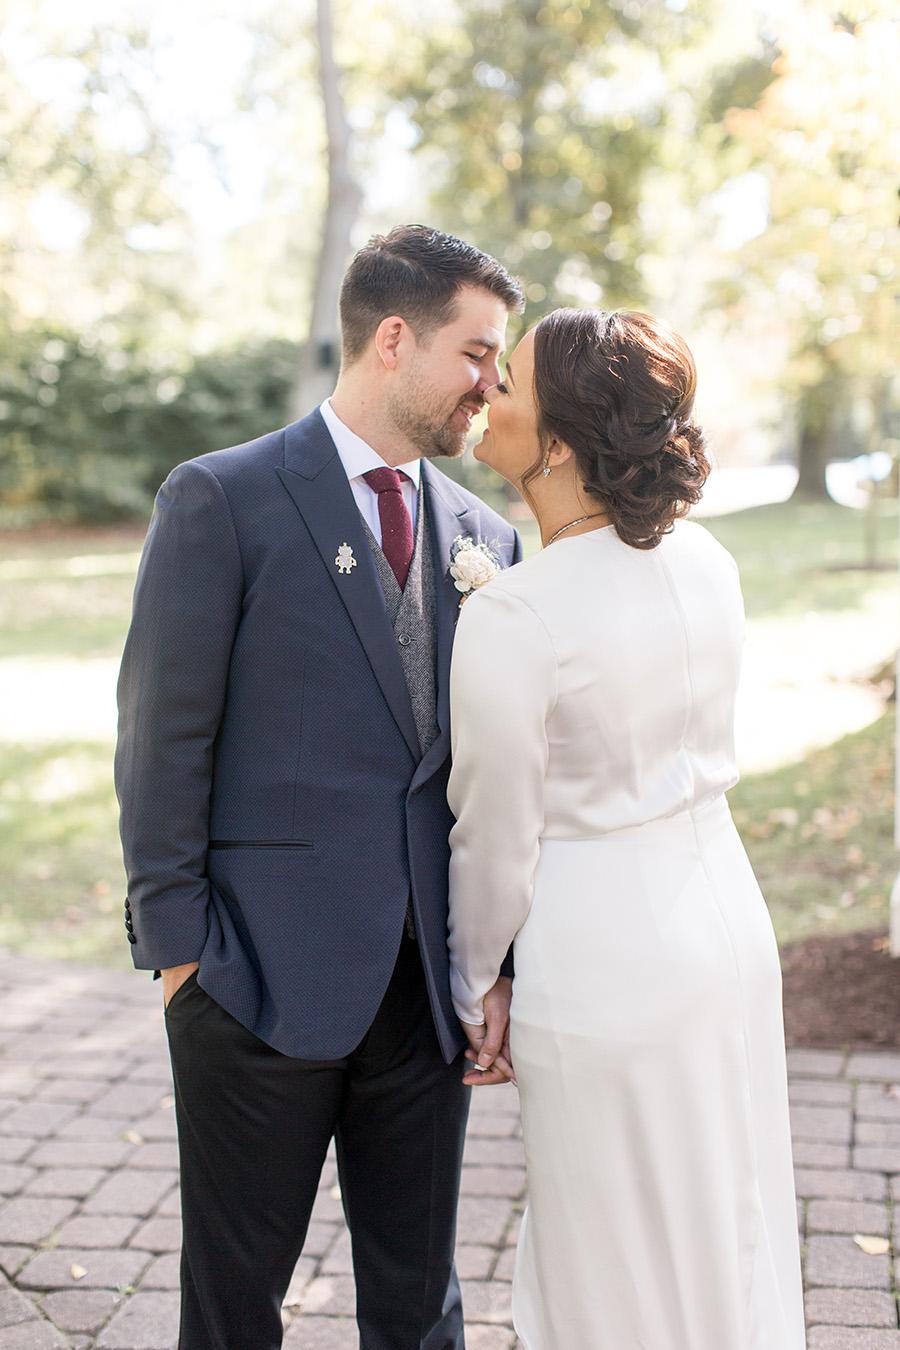 Groom in navy suit and bride in modern wedding dress